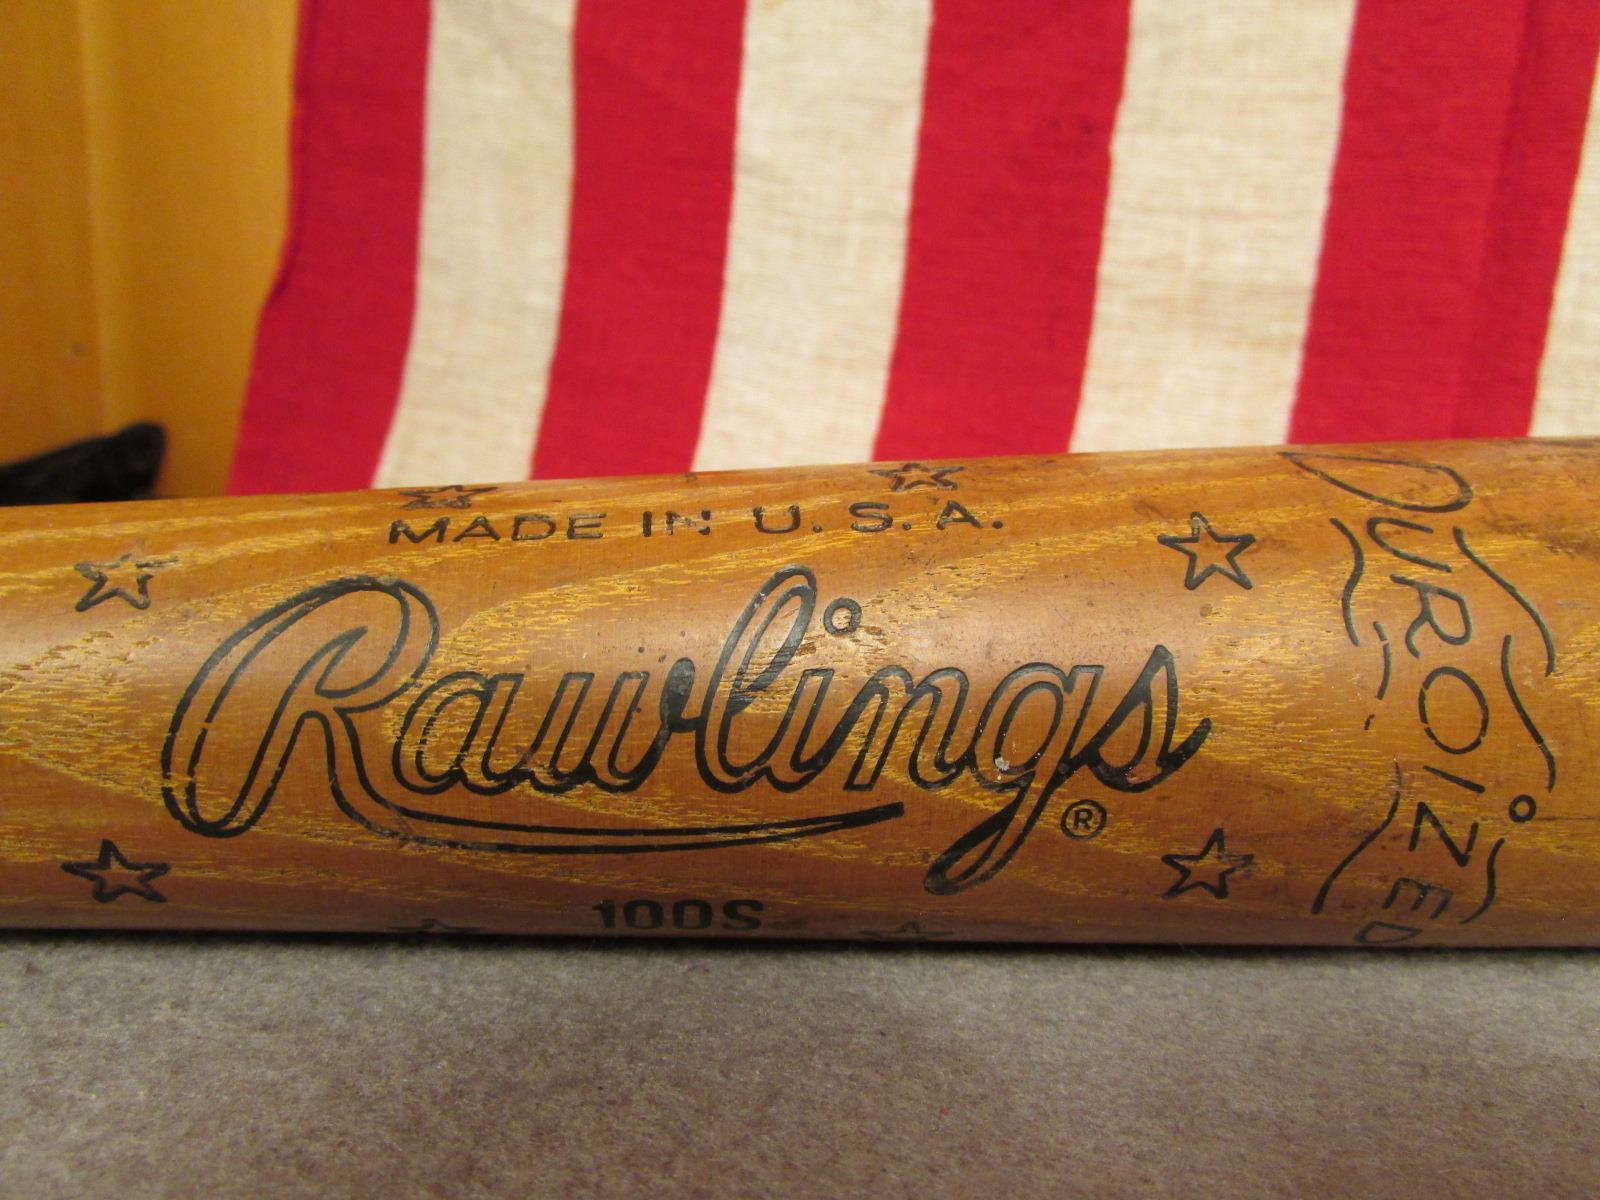 Vintage Rawlings Holz Baseball Schläger Profi Carl Yastrzemski Modell 86.4cm Hof